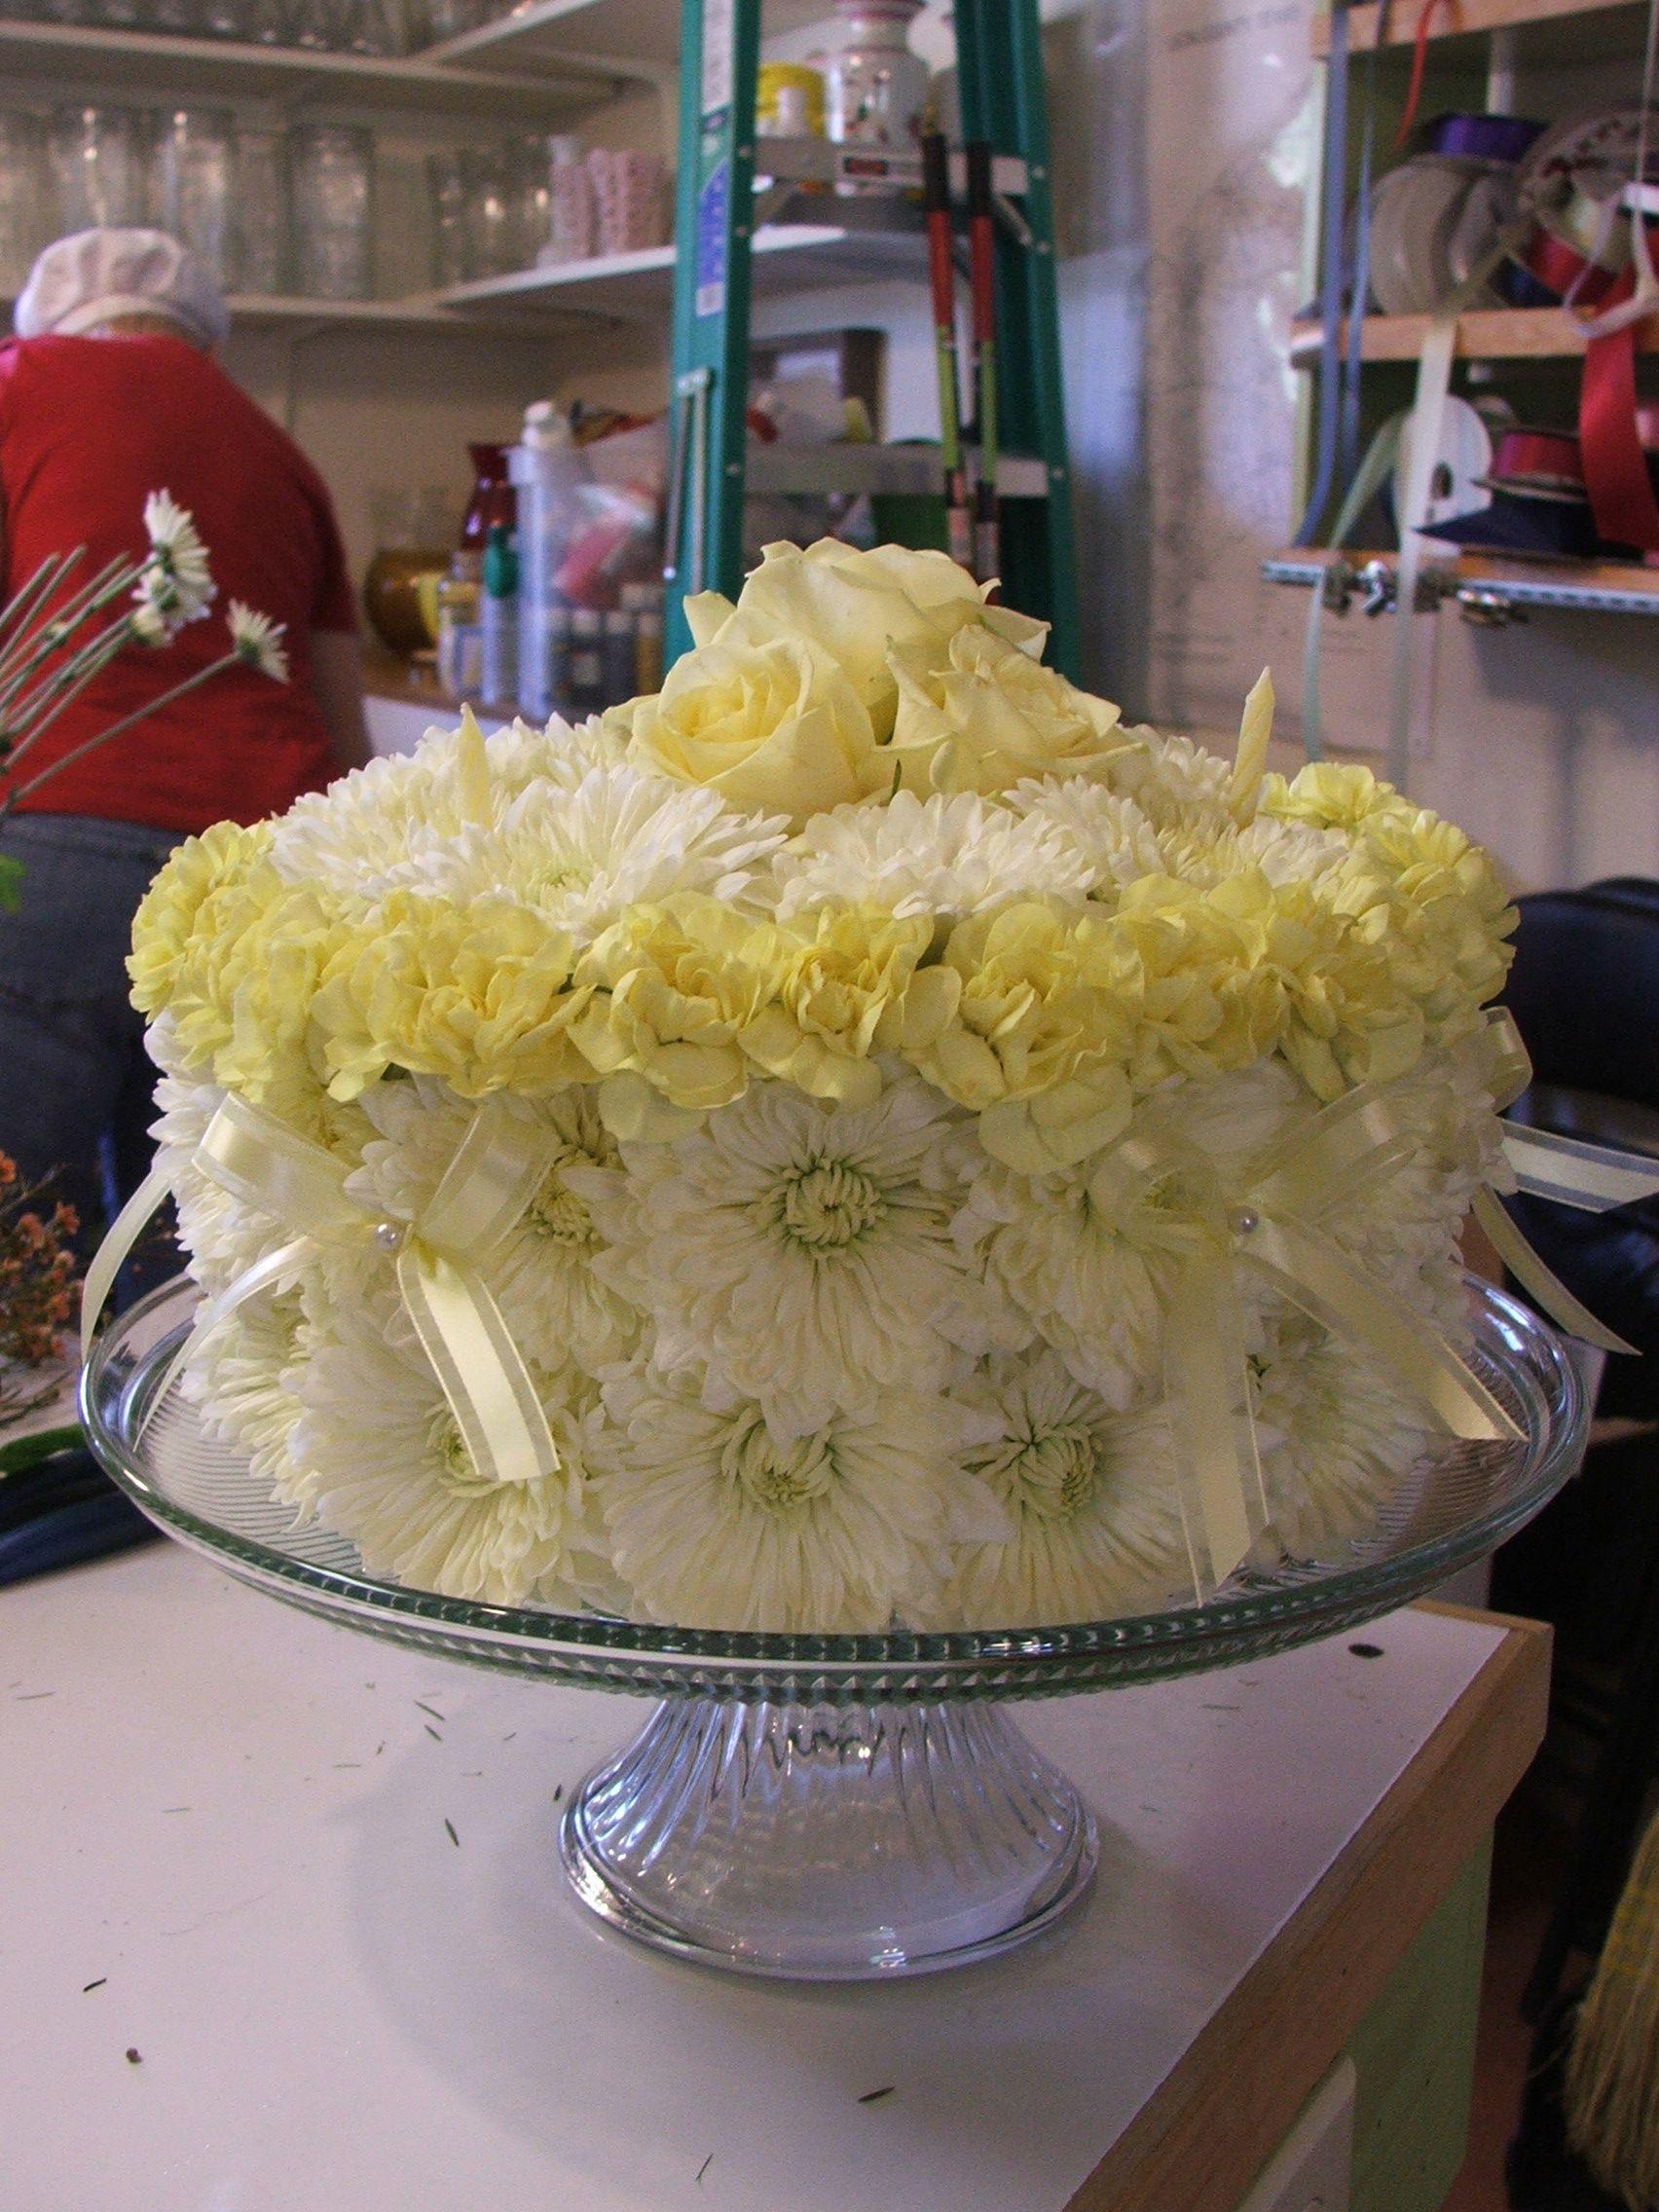 Flower Birthday Cake Design Cupcake Fresh Unique